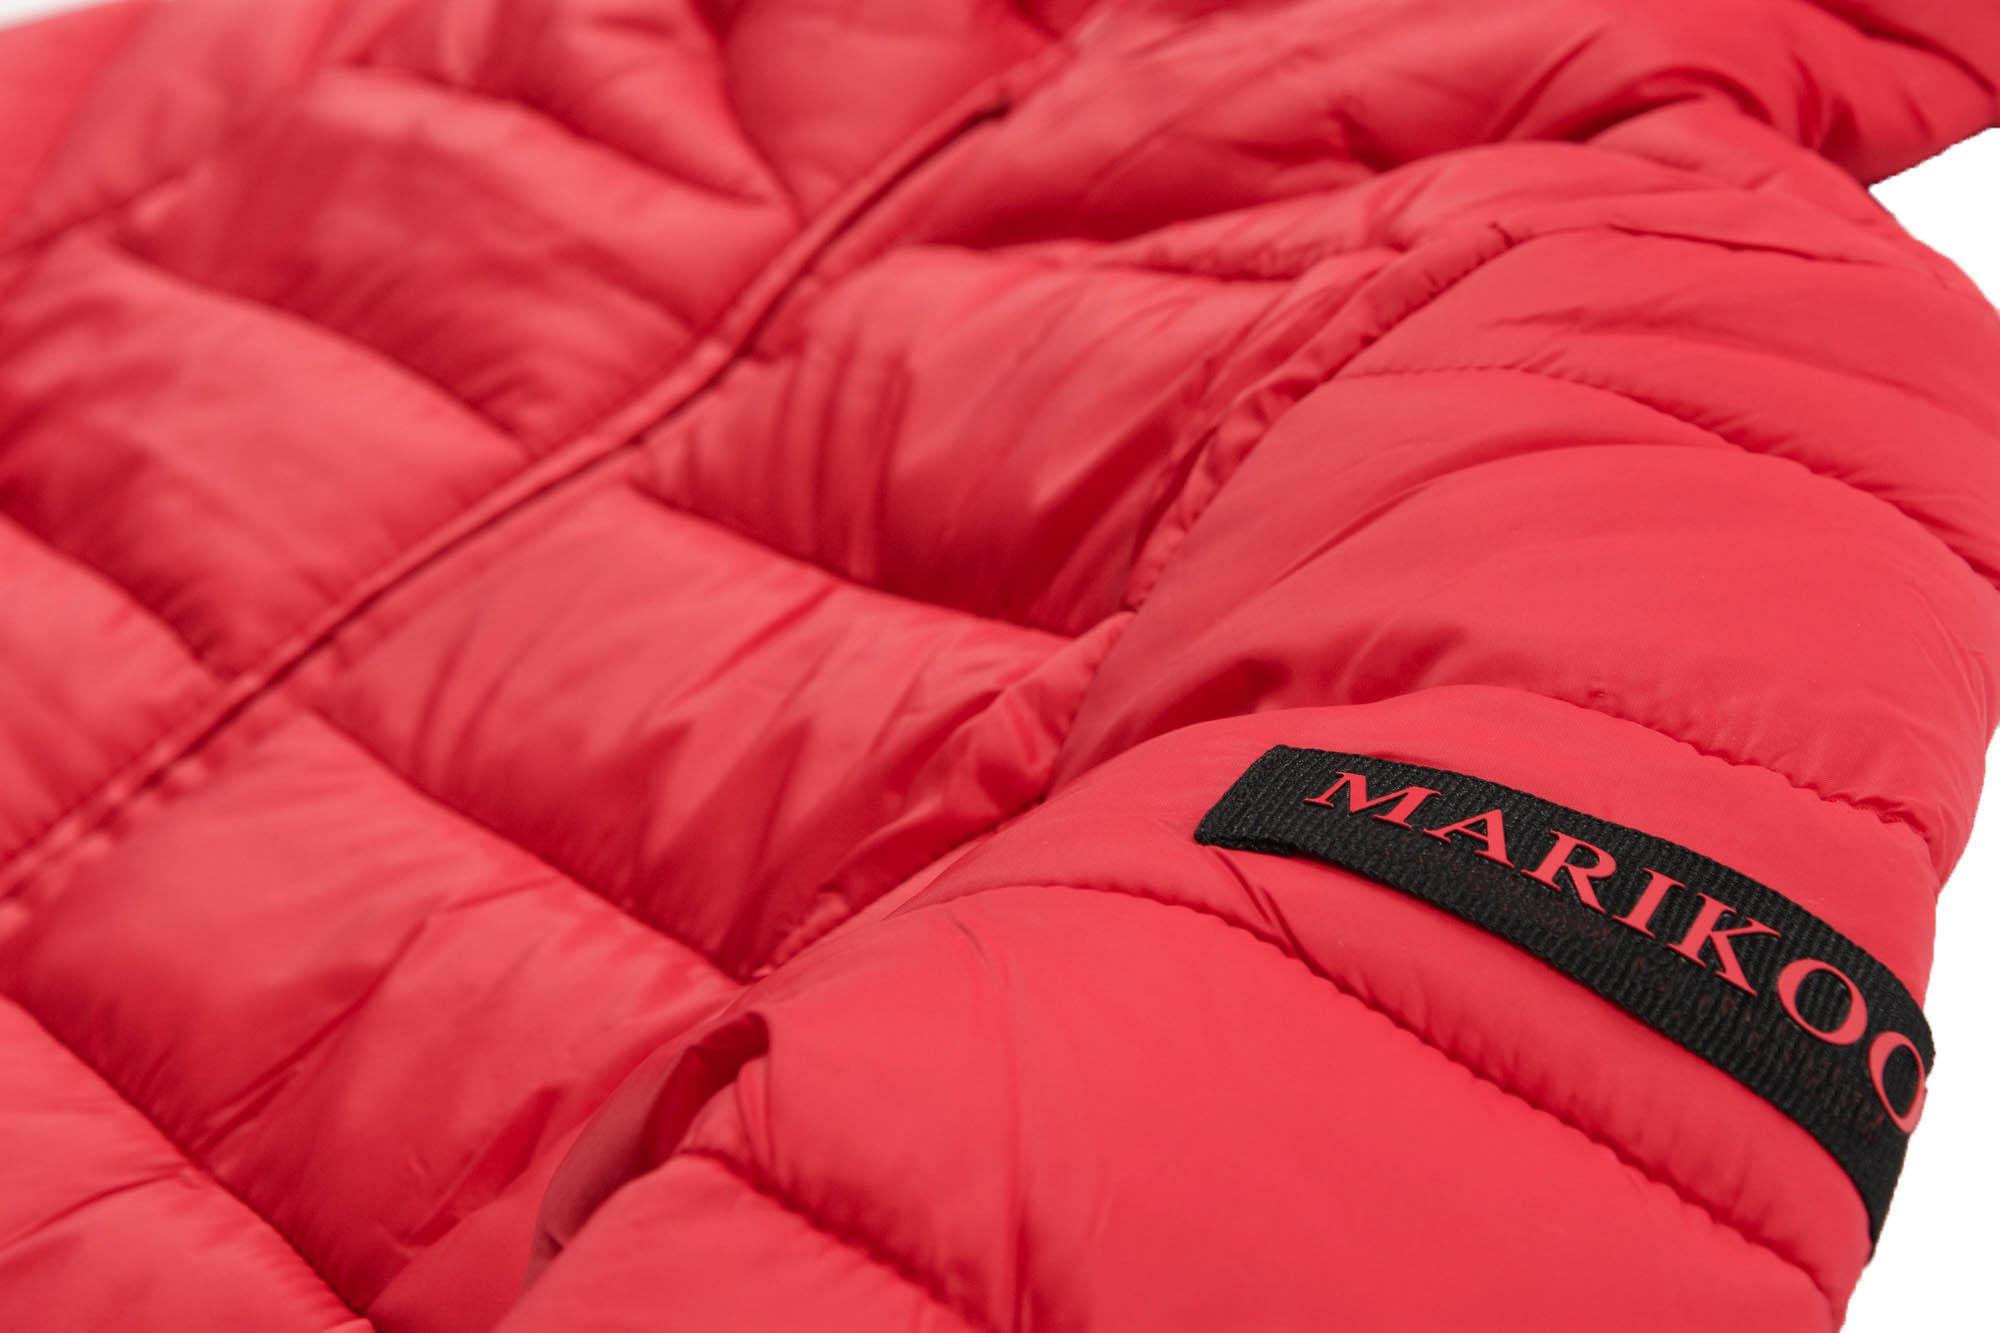 Marikoo-Lucy-Damen-Jacke-Steppjacke-Ubergangsjacke-gesteppt-Stepp-NEU-B651 Indexbild 24